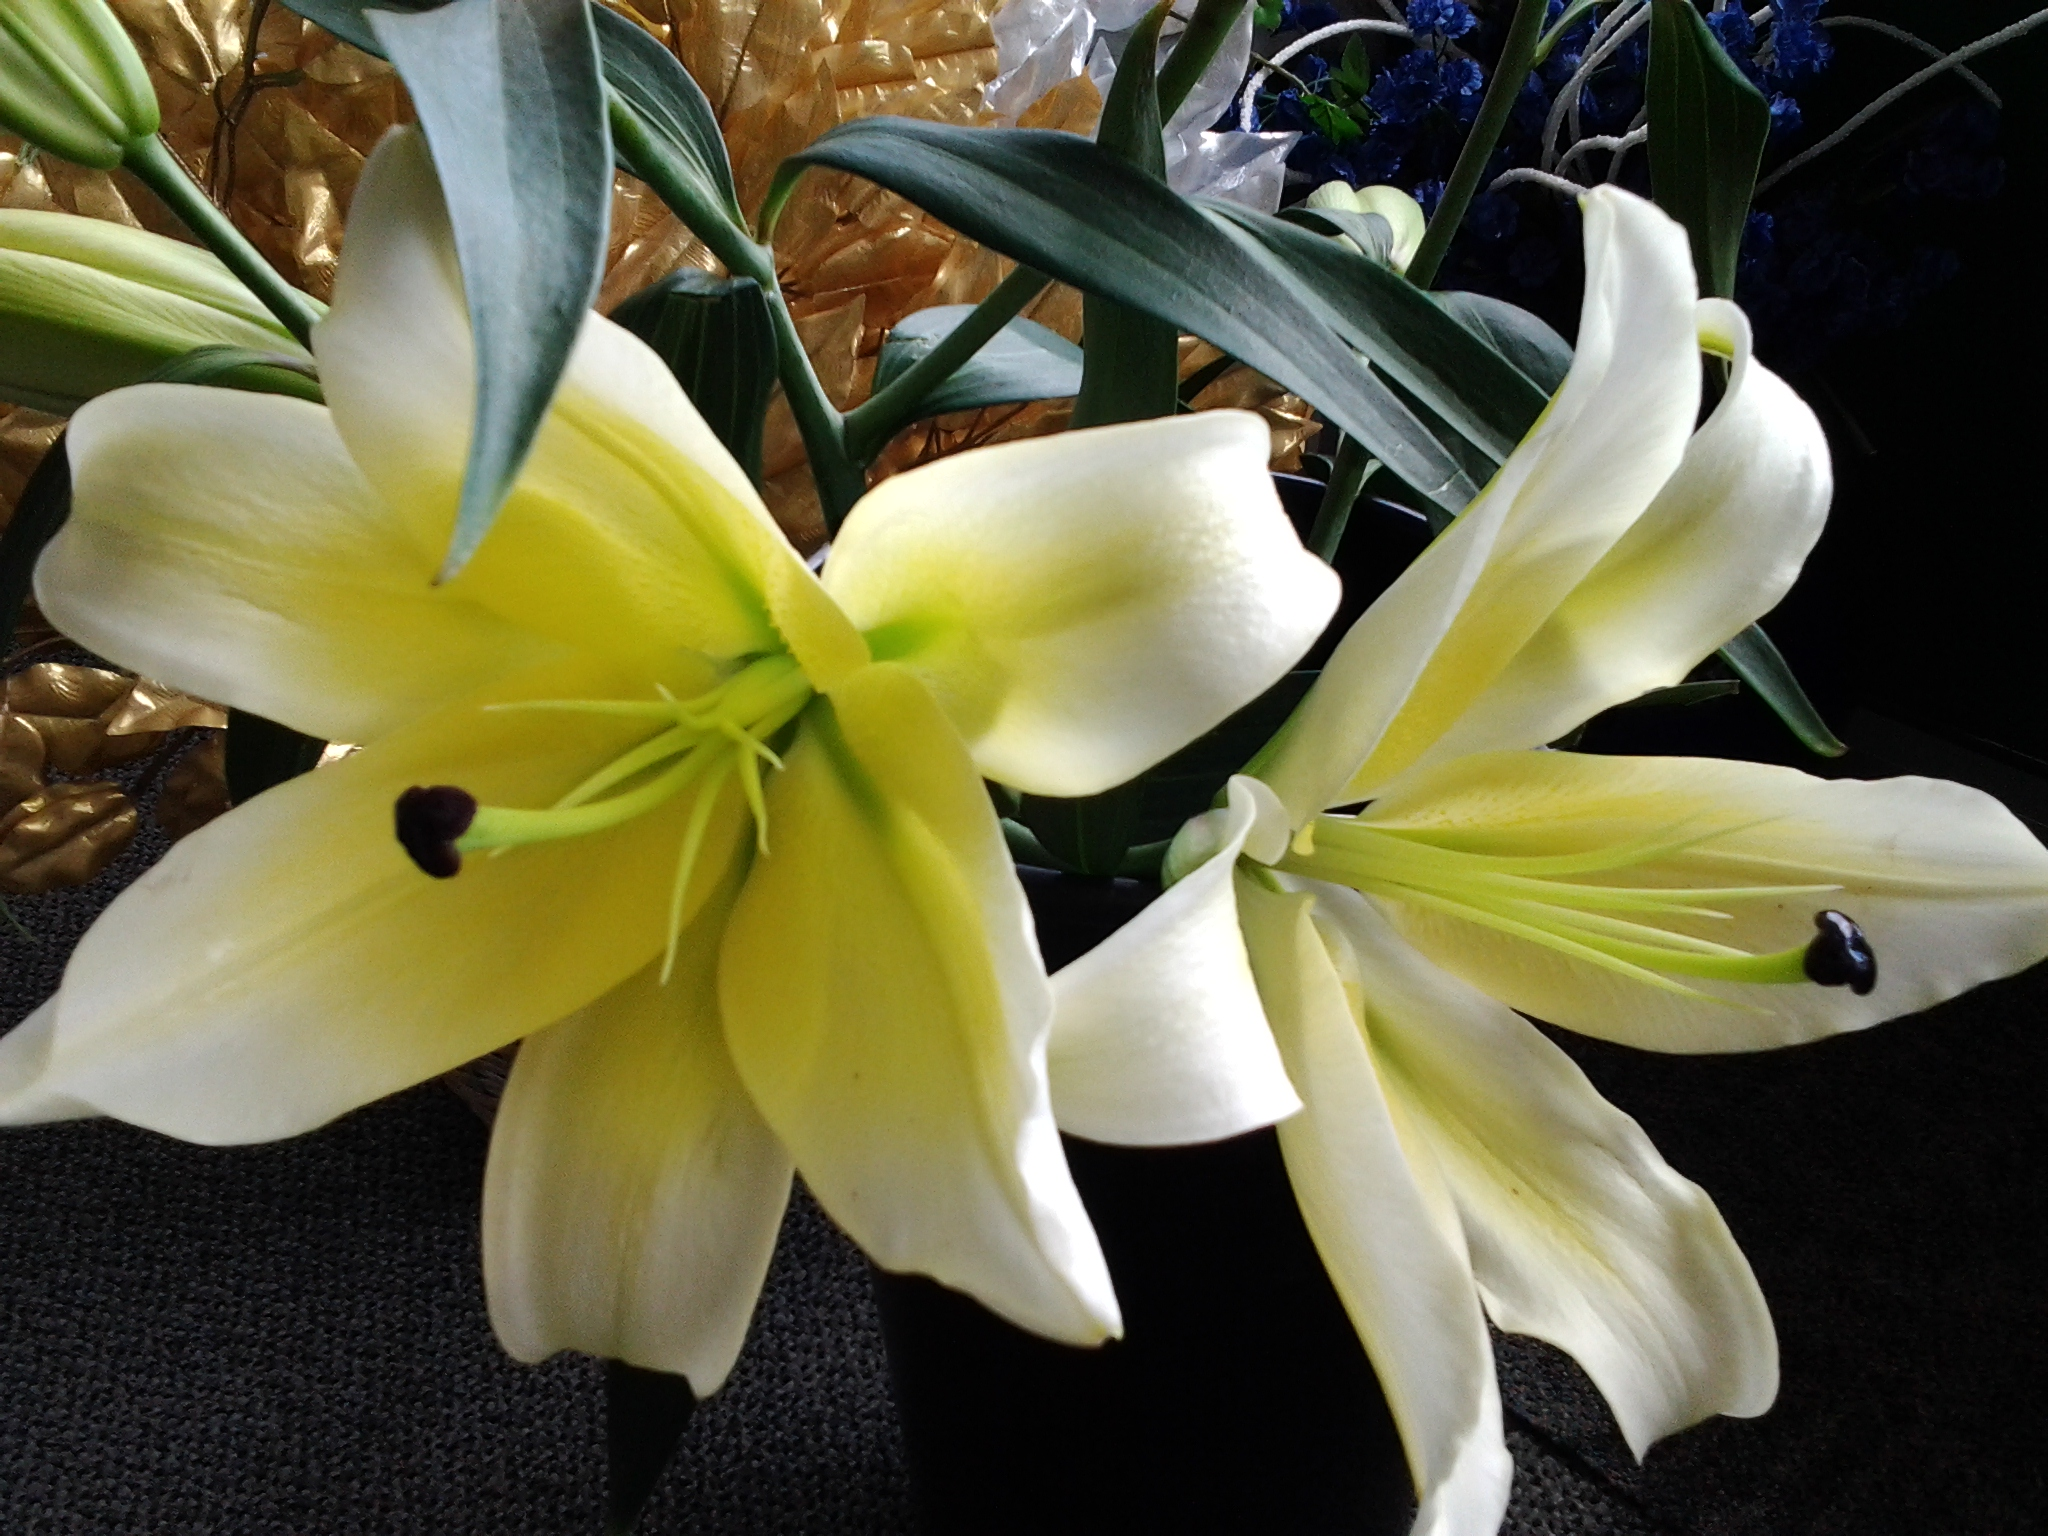 Tropical Interiors Florist Inc 1303 53rd Ave W Bradenton Fl